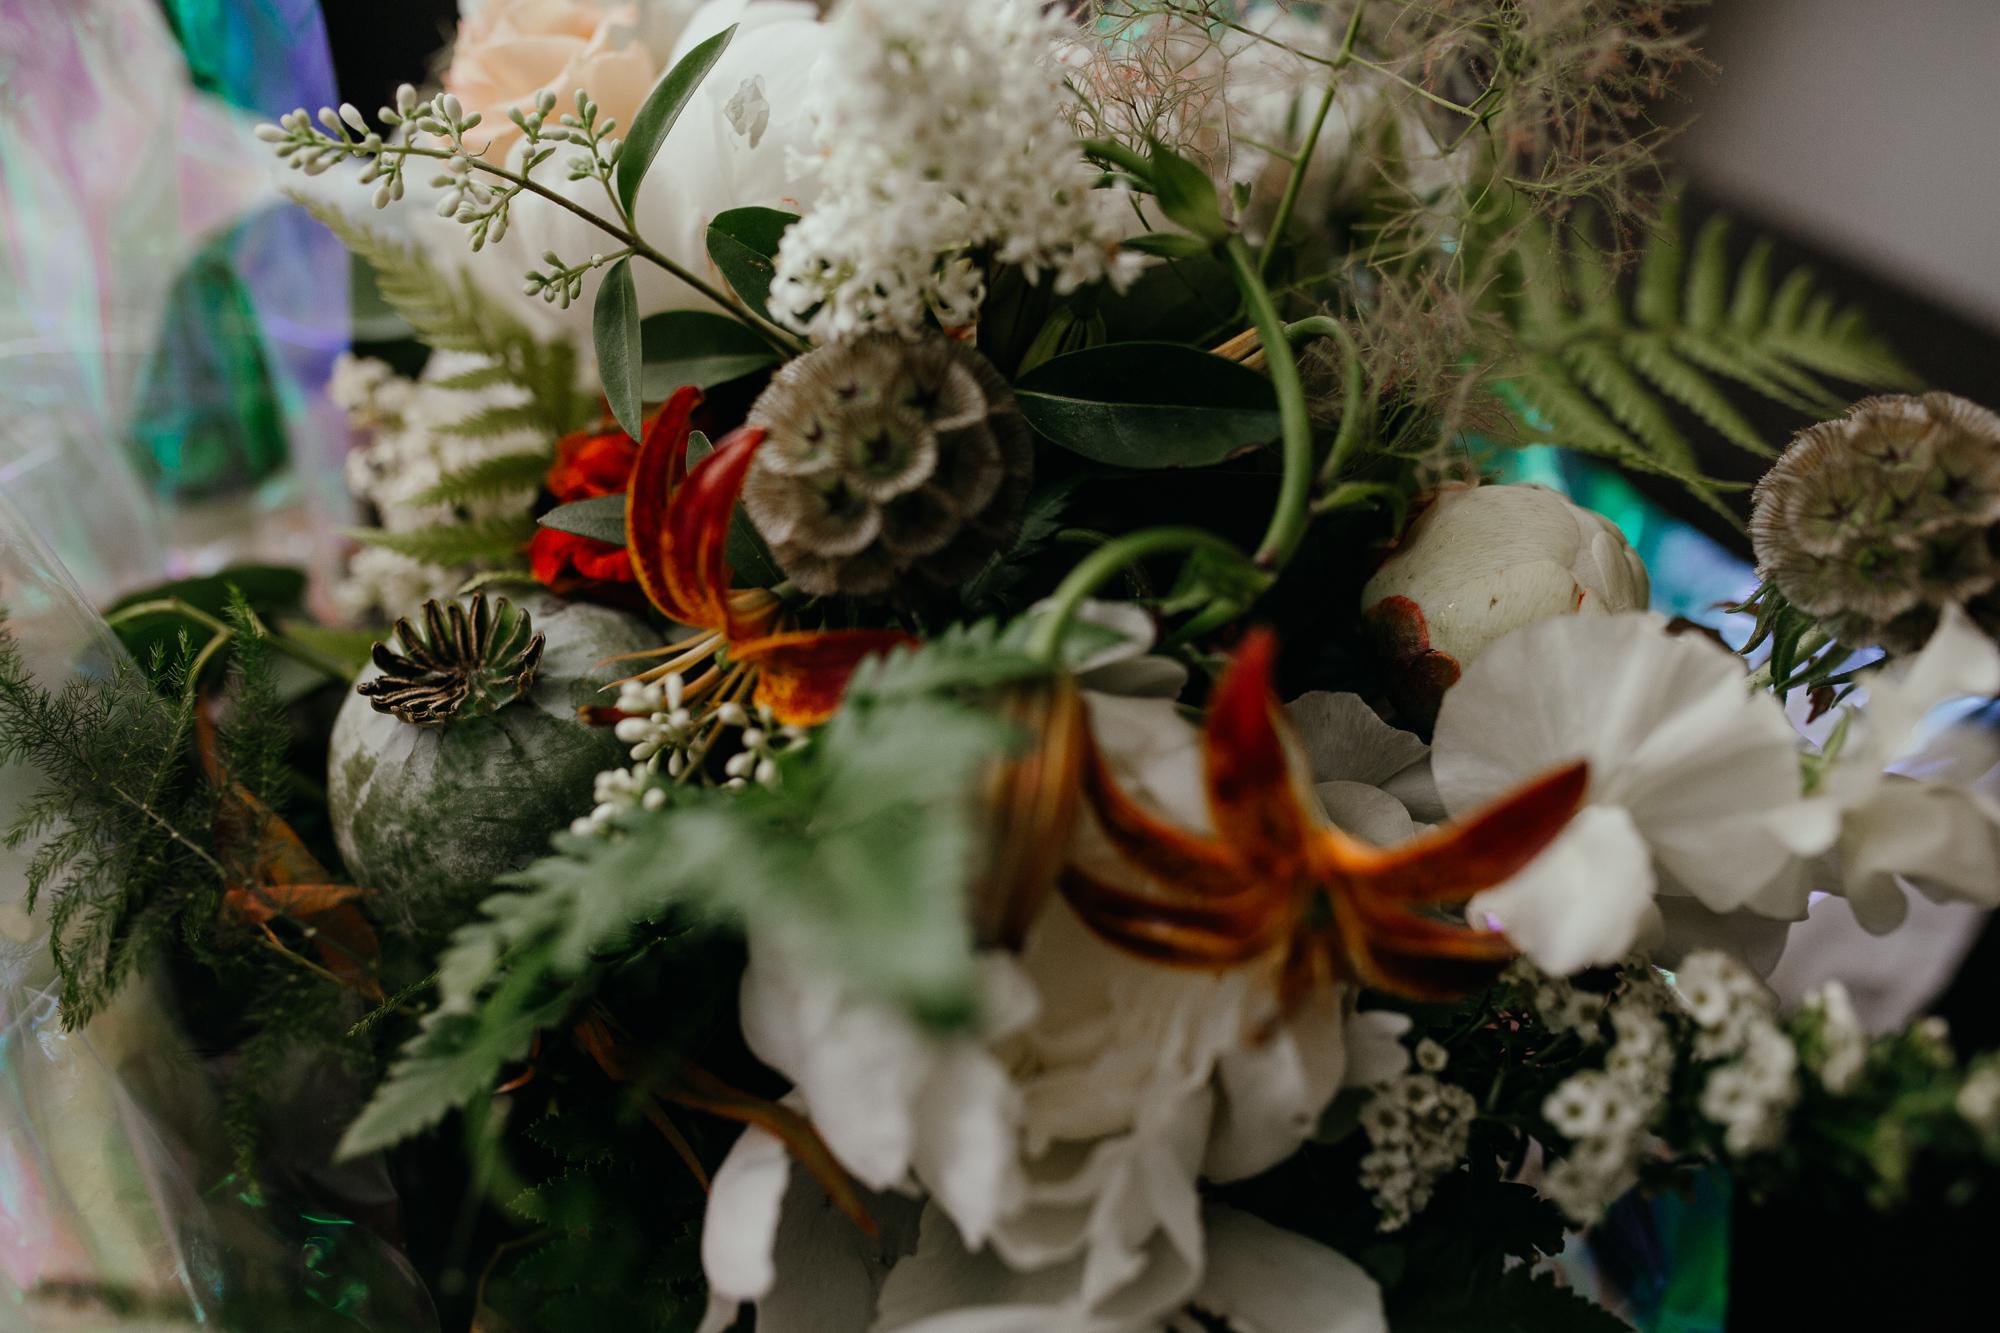 stephanie-green-wedding-photography-sulaflowers-sula-flowers-london-islington-town-hall-depot-n7-17.jpg